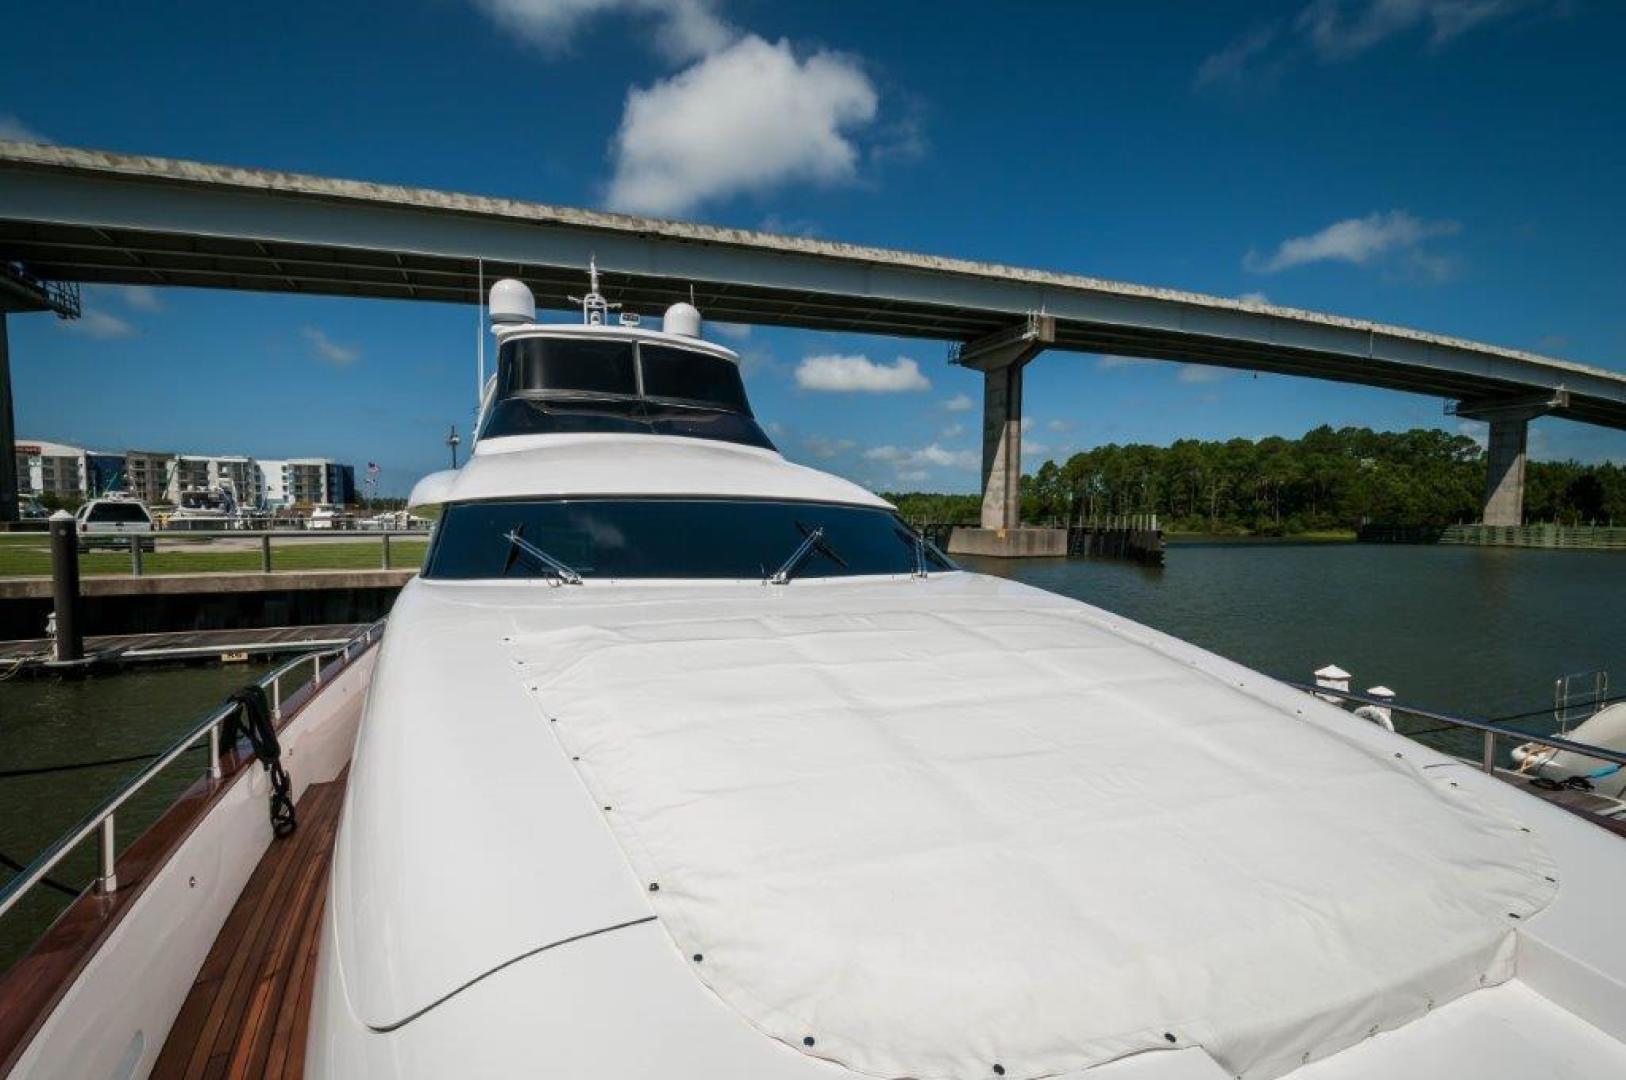 Maiora-84 Motor Yacht 2015-Never Rest SANDESTIN-Florida-United States-2015 Maiora 84 Motor Yacht Bow Cushion Never Rest-720532 | Thumbnail